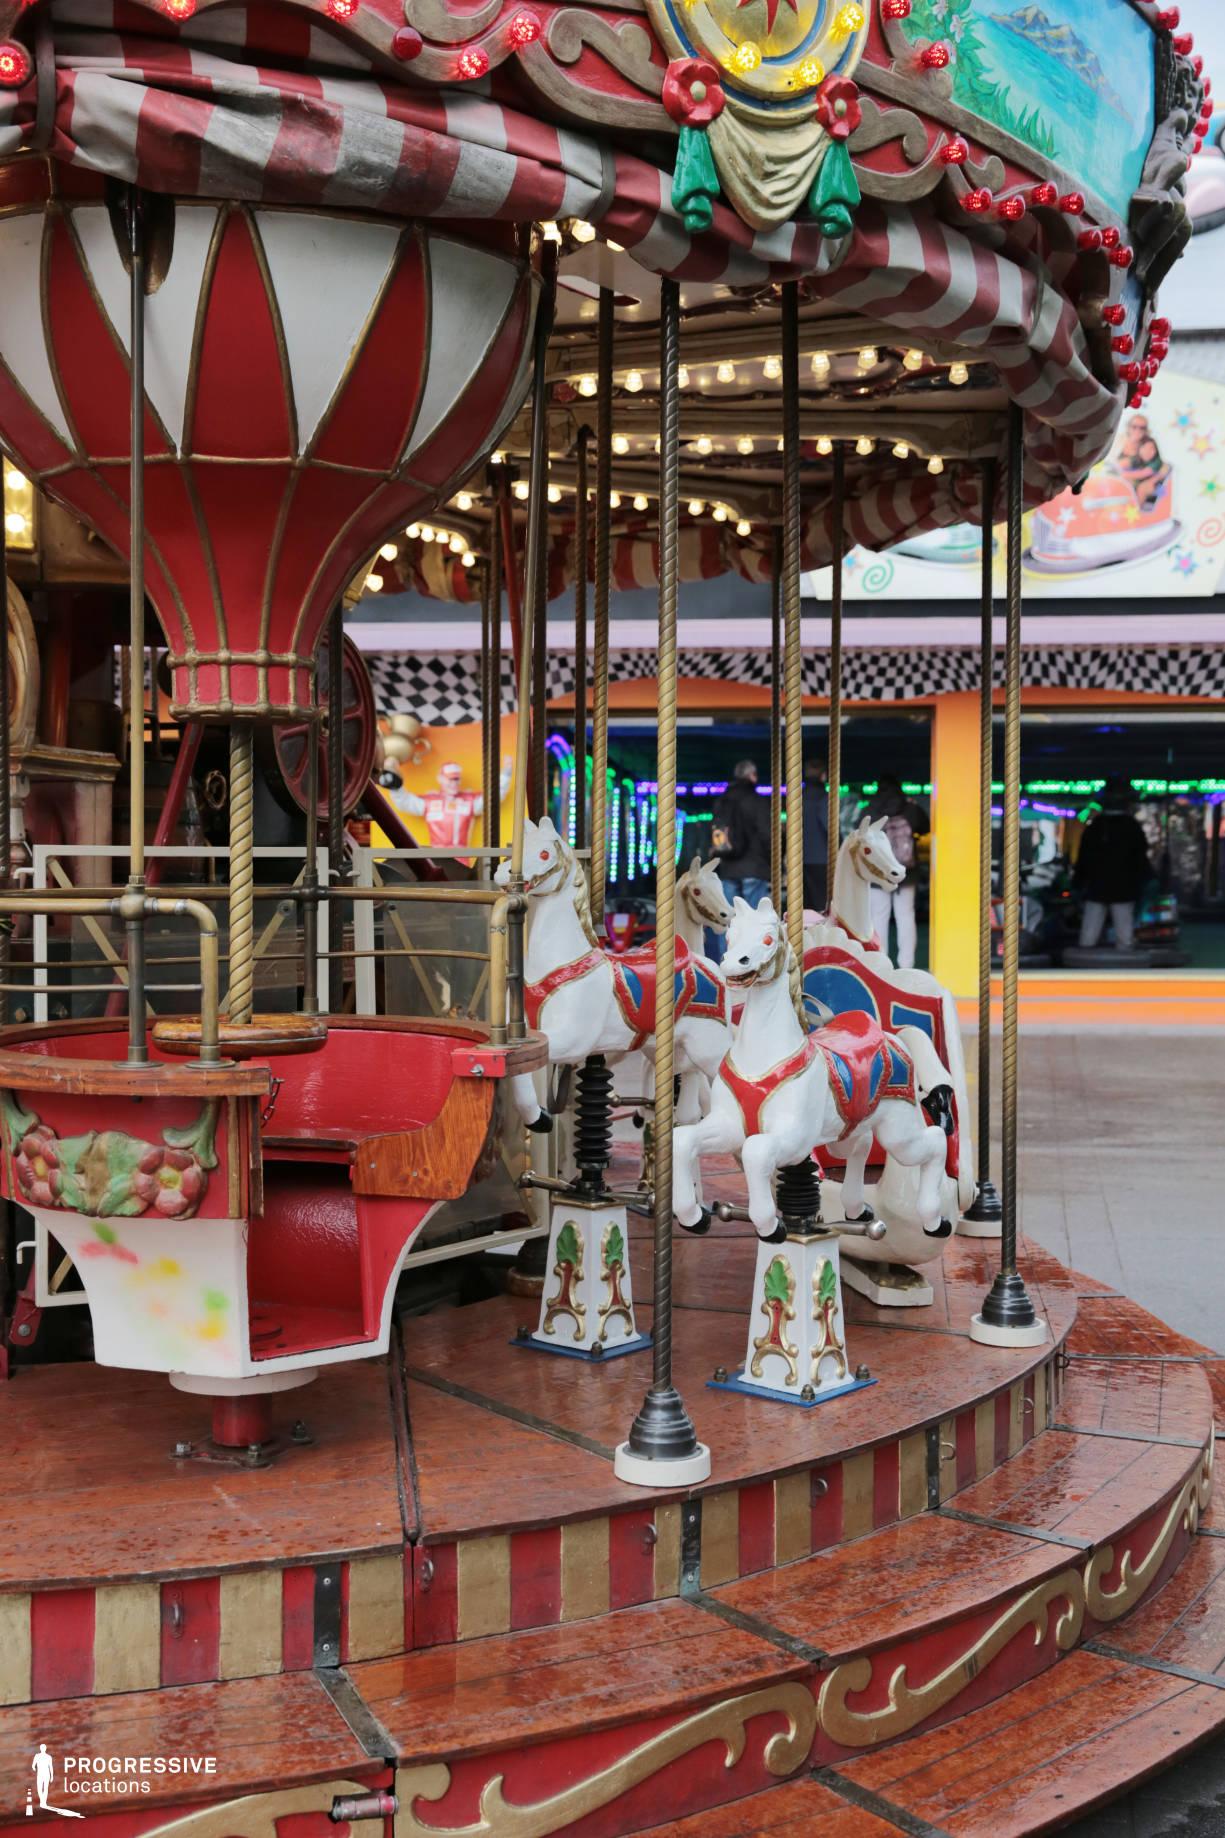 Locations in Austria: Vintage Wooden Carousel, Amusement Park